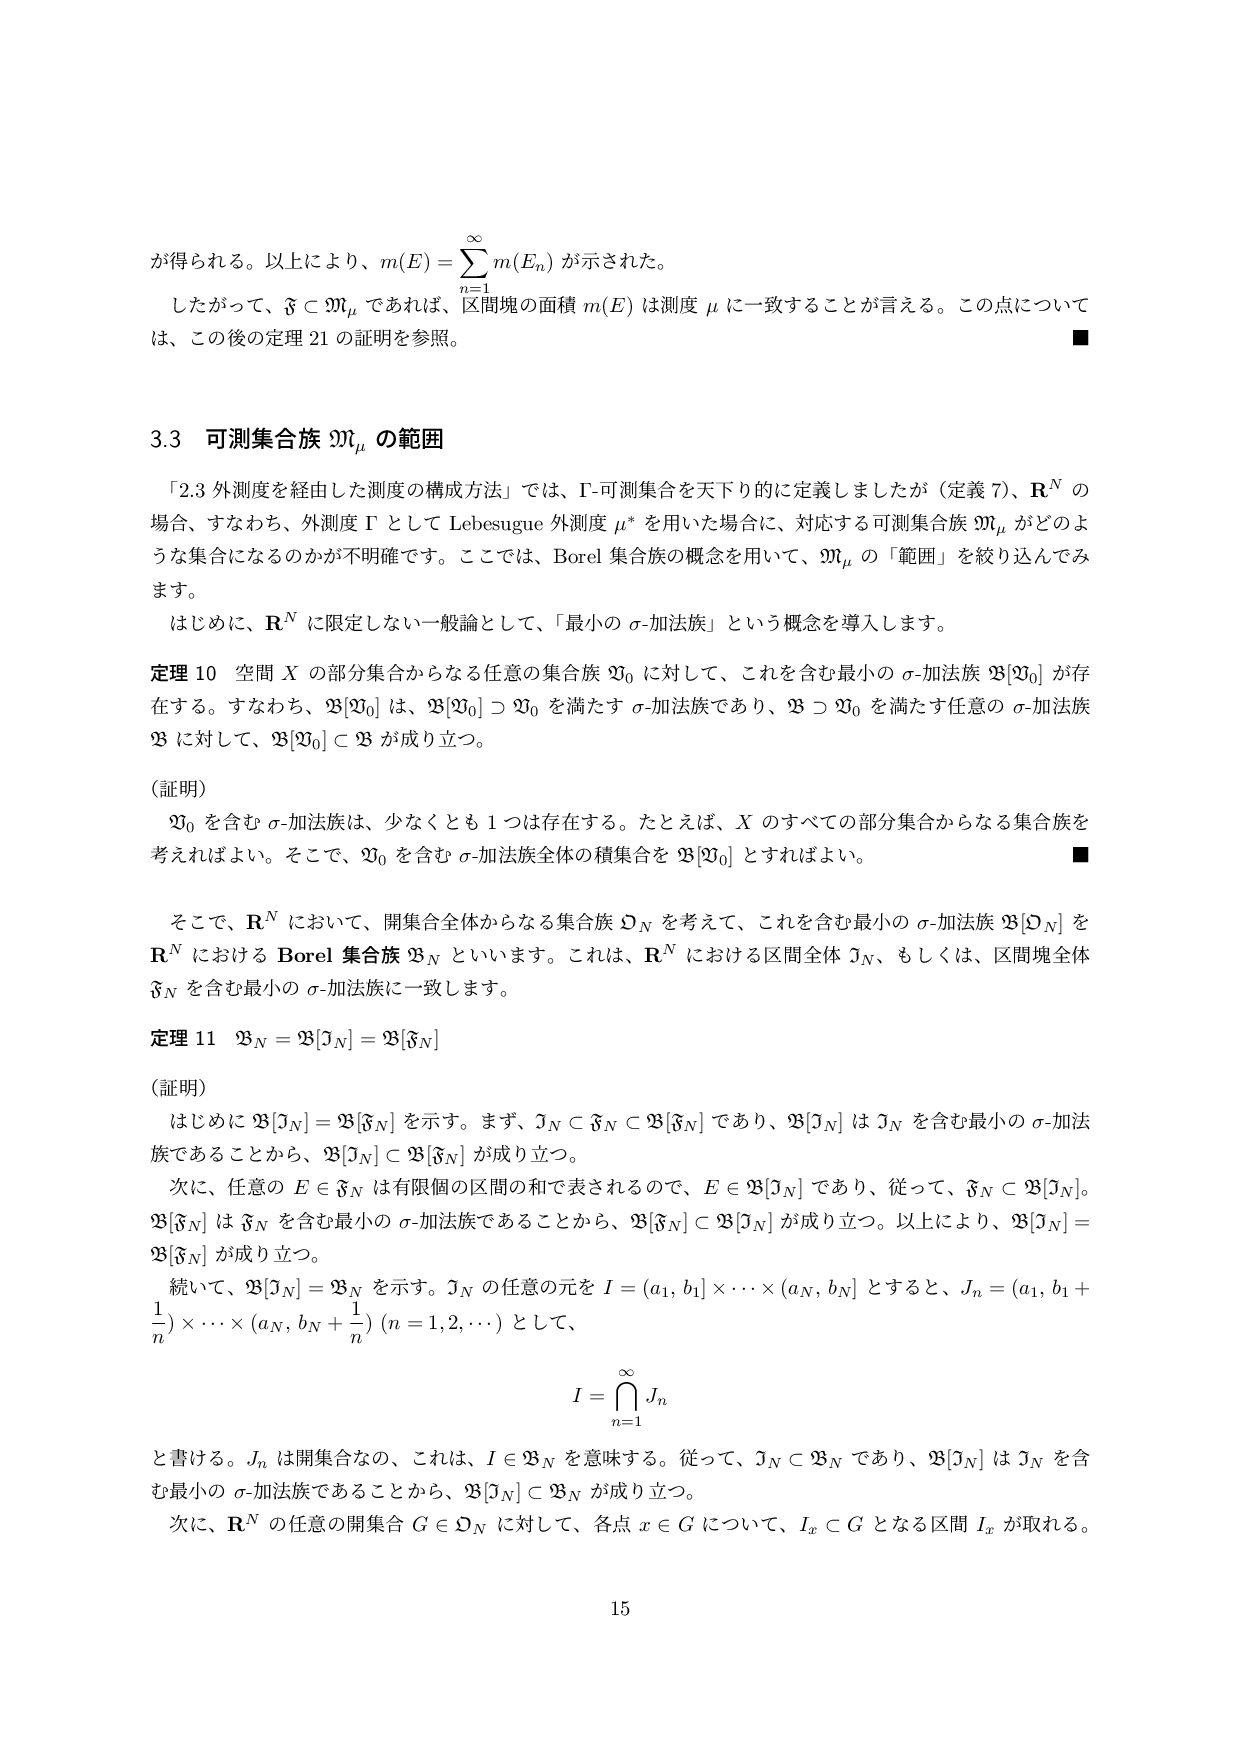 ʹɺͦΕͧΕͷ In = (an1 , bn1 ] × · · · × (anN , bnN...